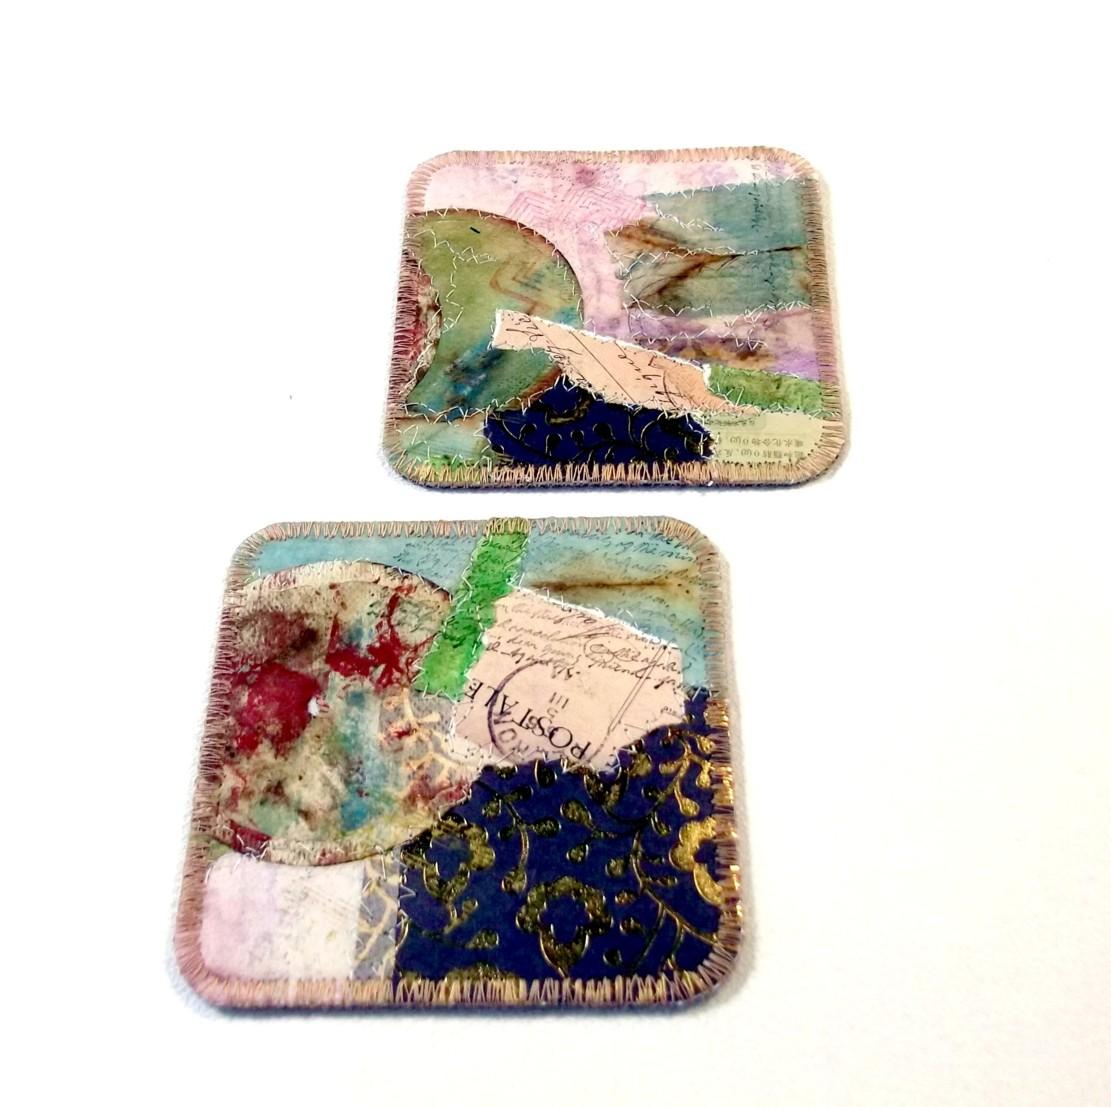 Mixed media stitched coasters